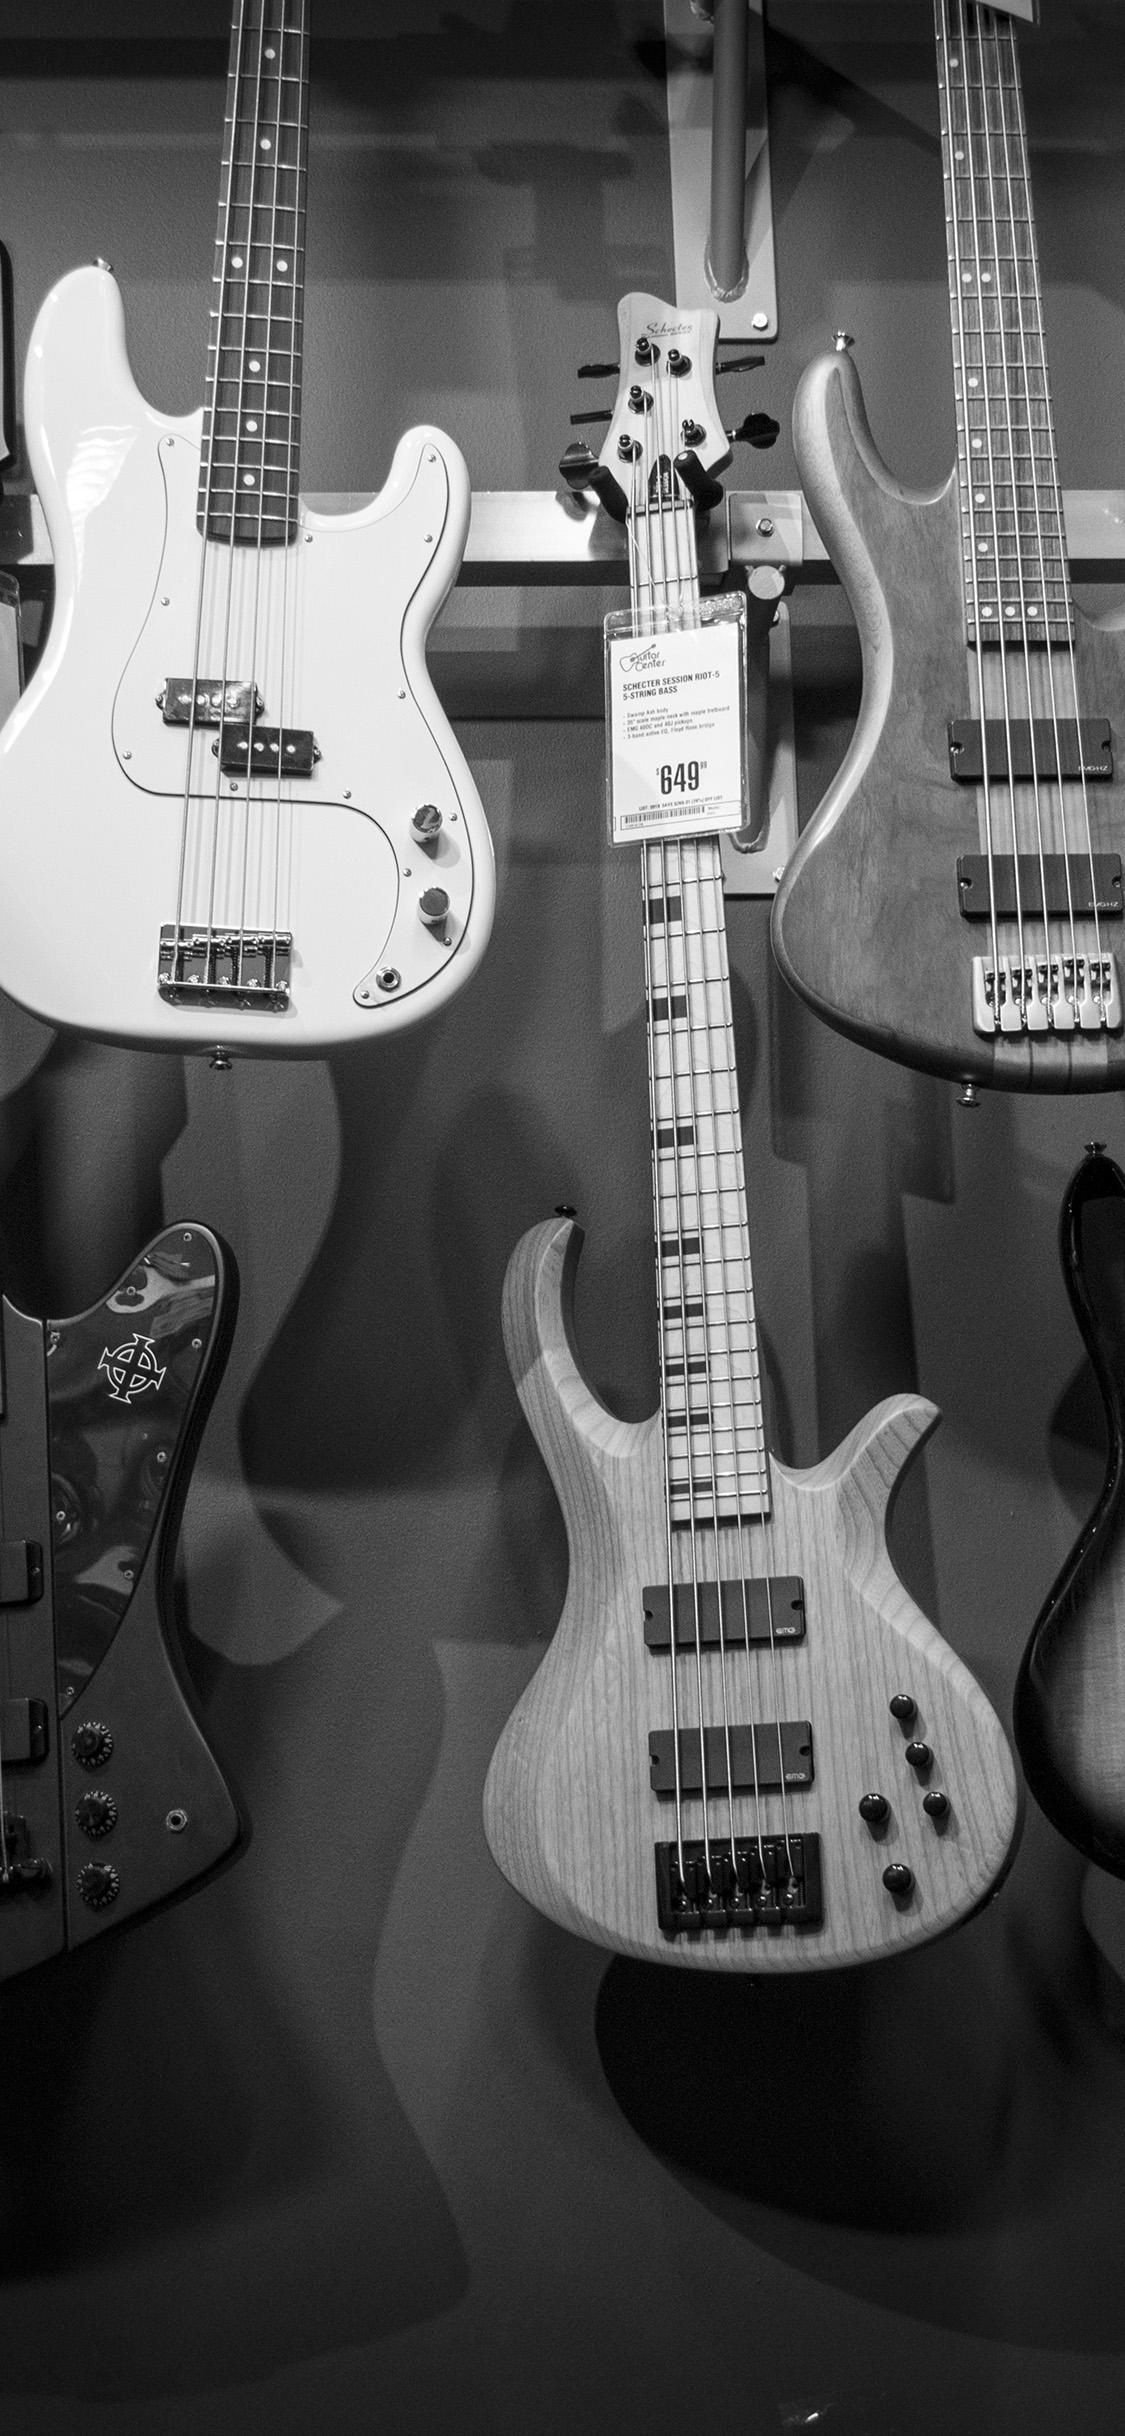 iPhonexpapers.com-Apple-iPhone-wallpaper-oc12-guitar-music-instrument-bw-nature